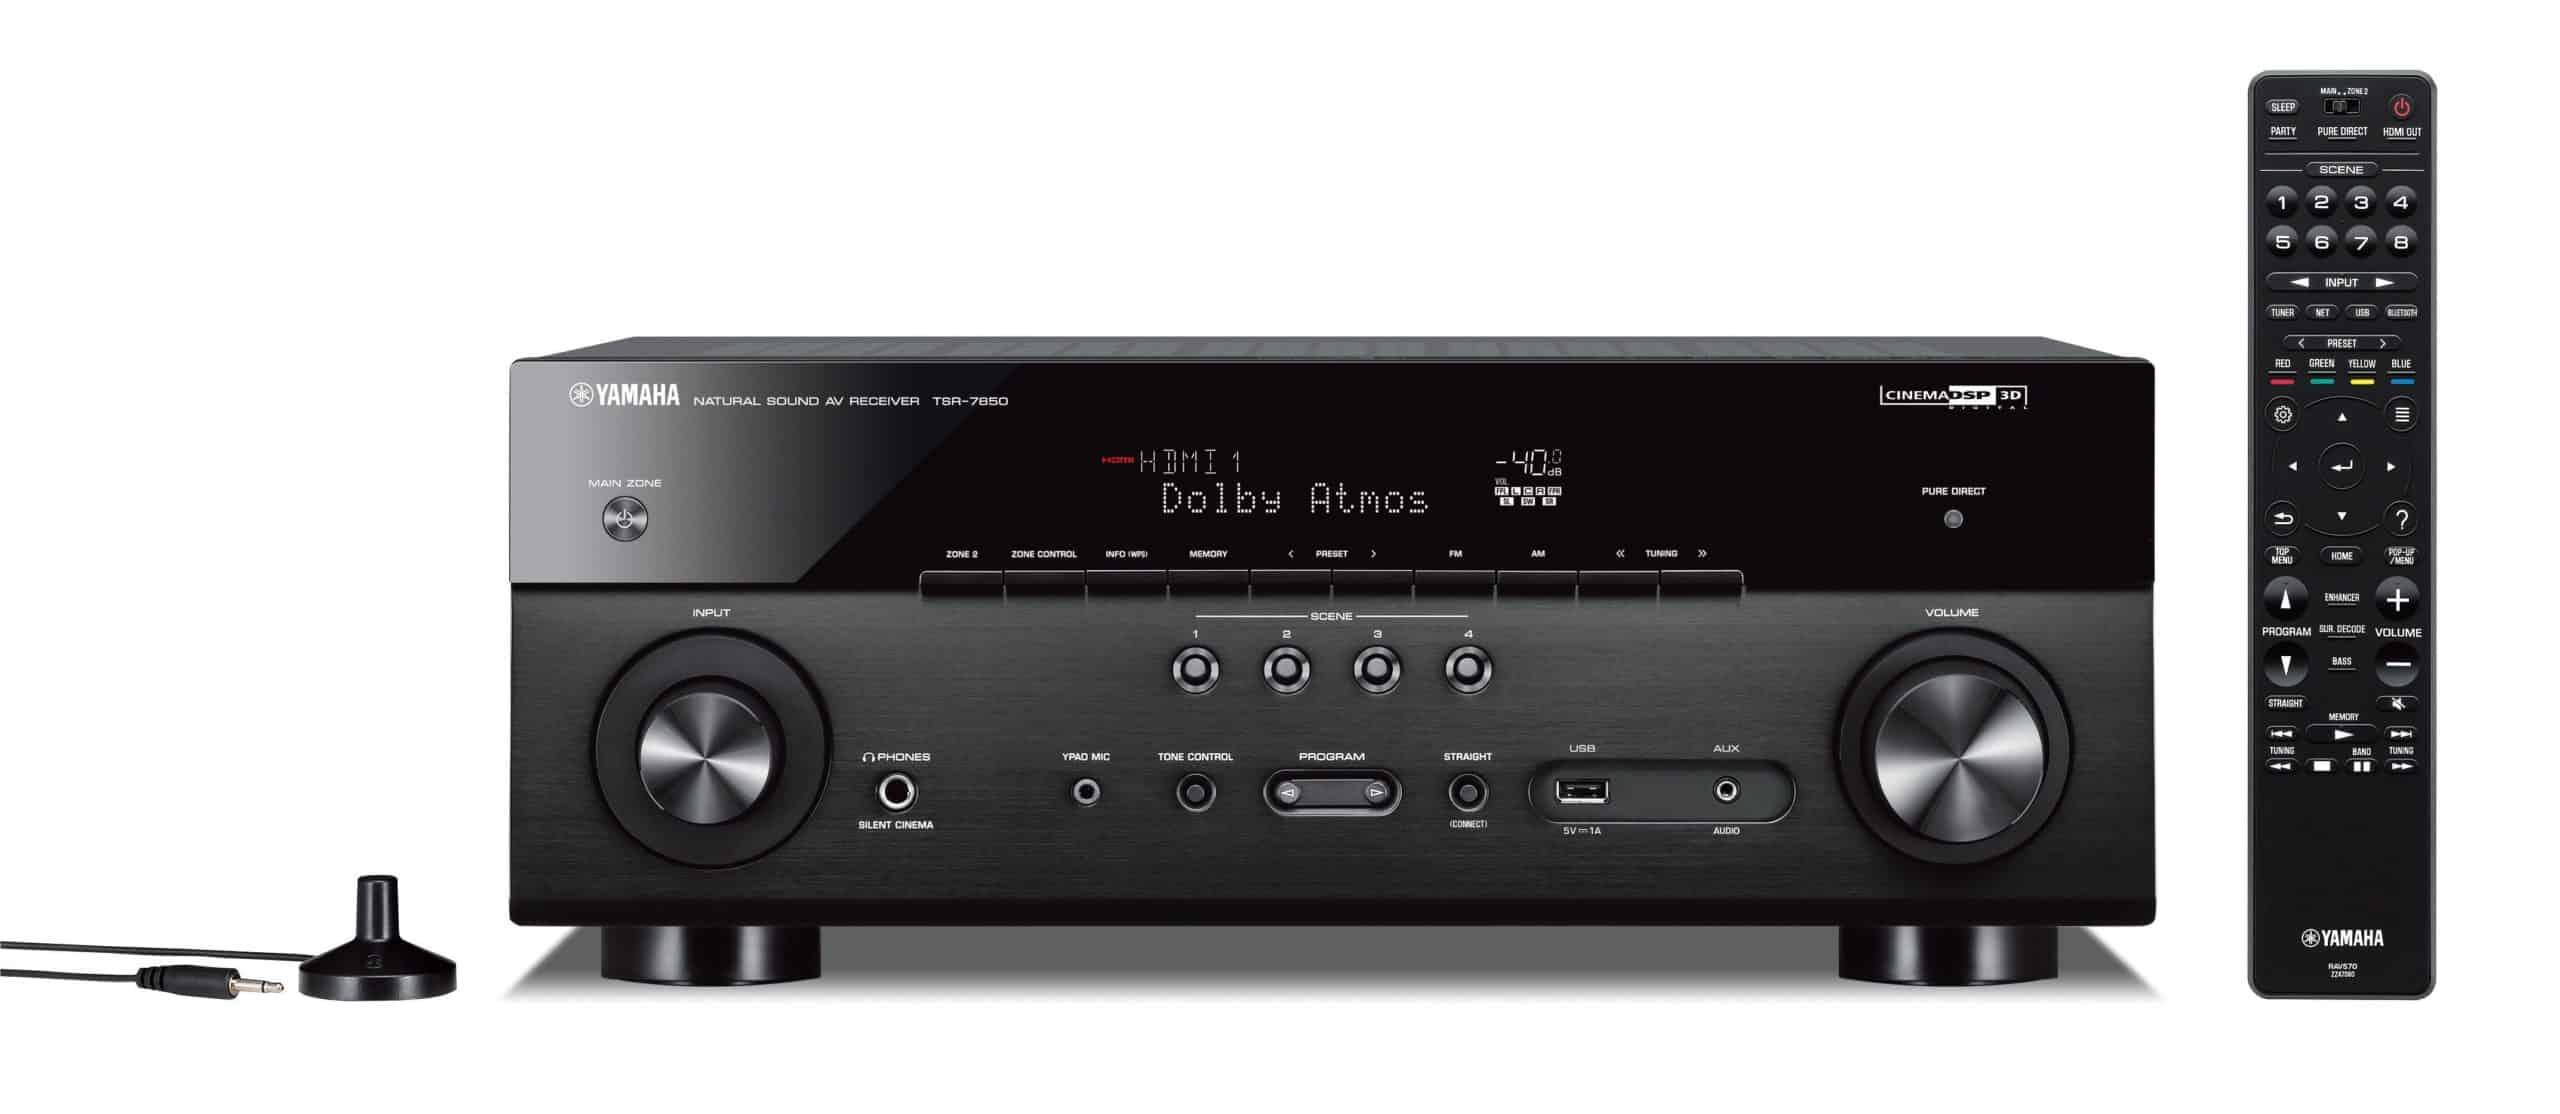 Yamaha TSR-7850R 7.2-Channel Network AV Receiver - Woot